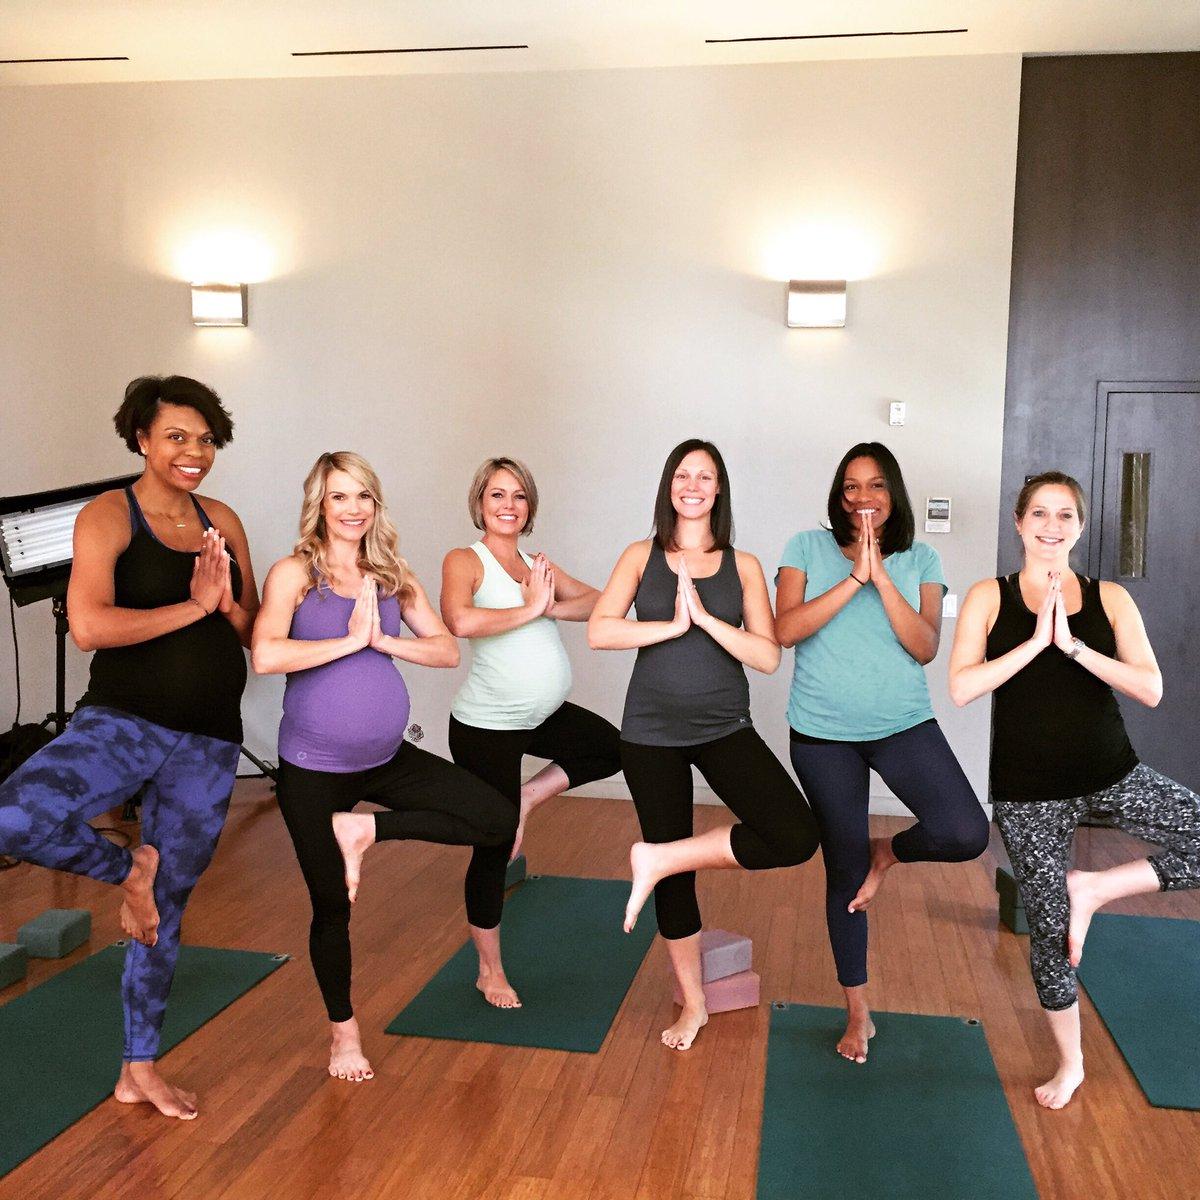 Pregnant Yoga Class Near Me - Yoga For You